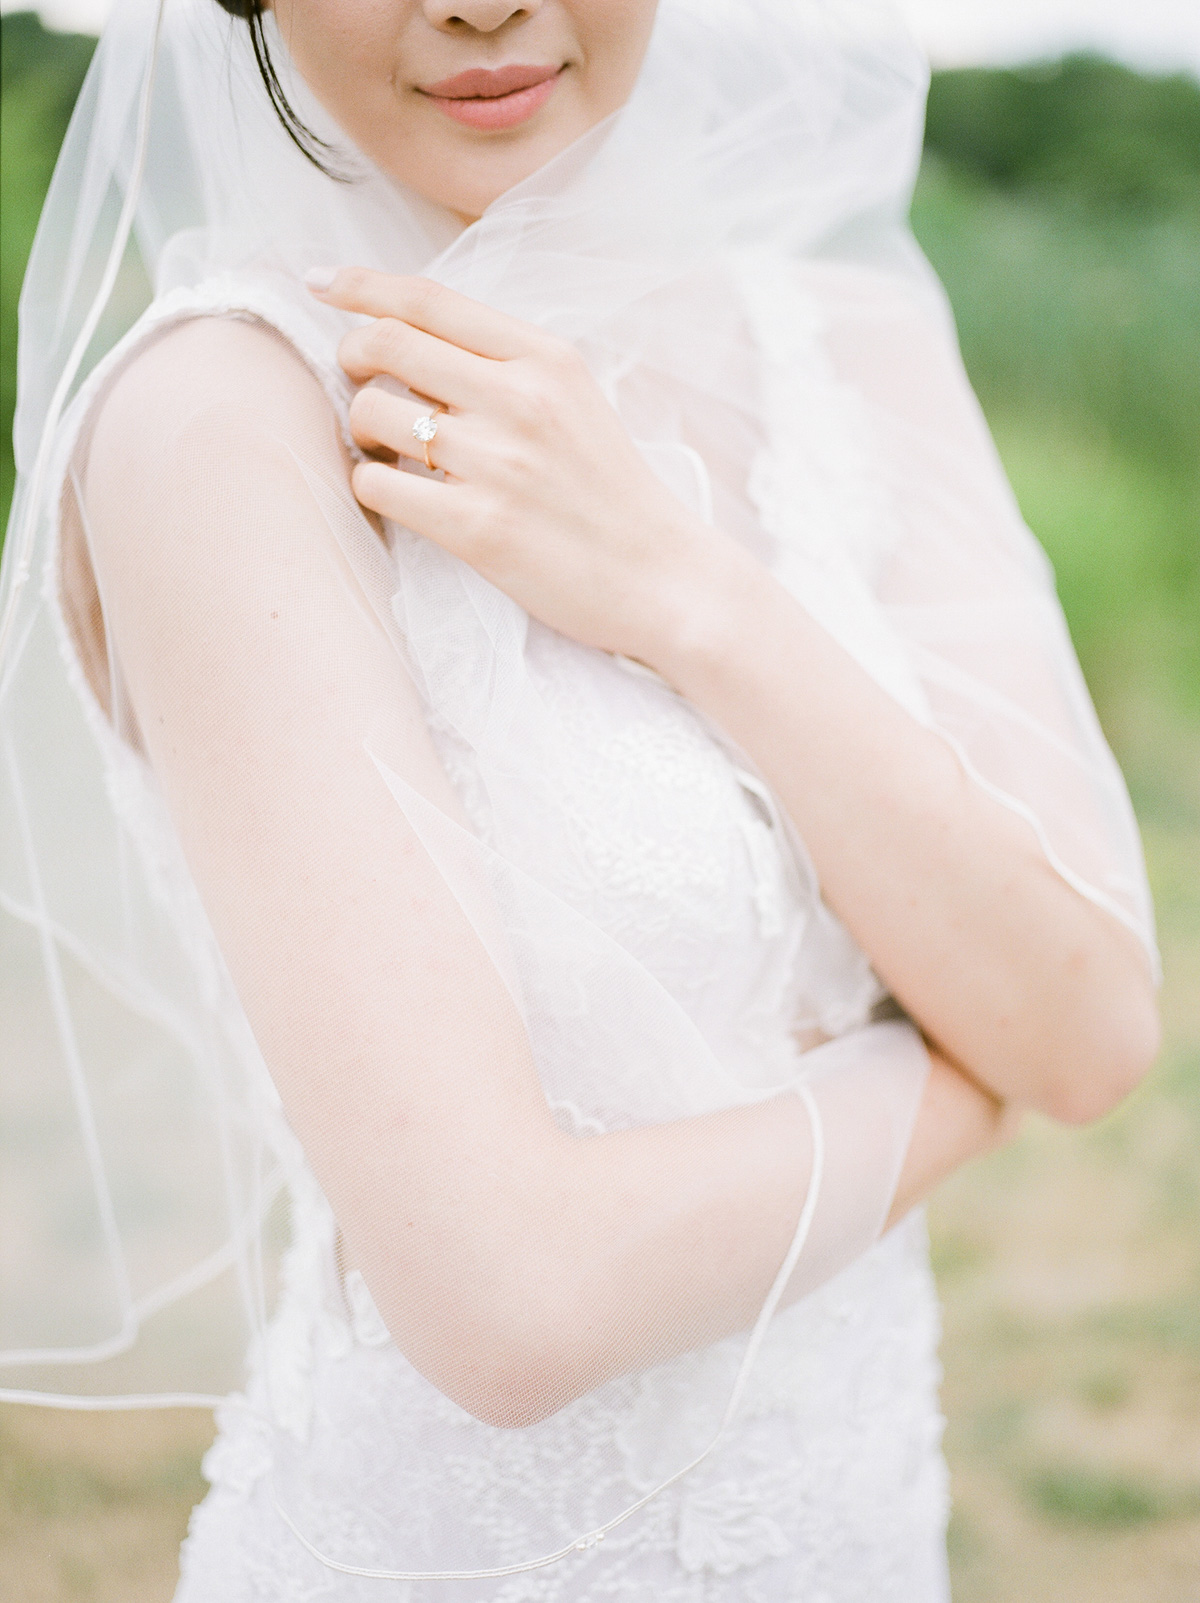 jennifer-xu-photography-vineyard-bride-swish-list-rosewod-eatstes-winery-beamsville-wedding-editorial-18.jpg